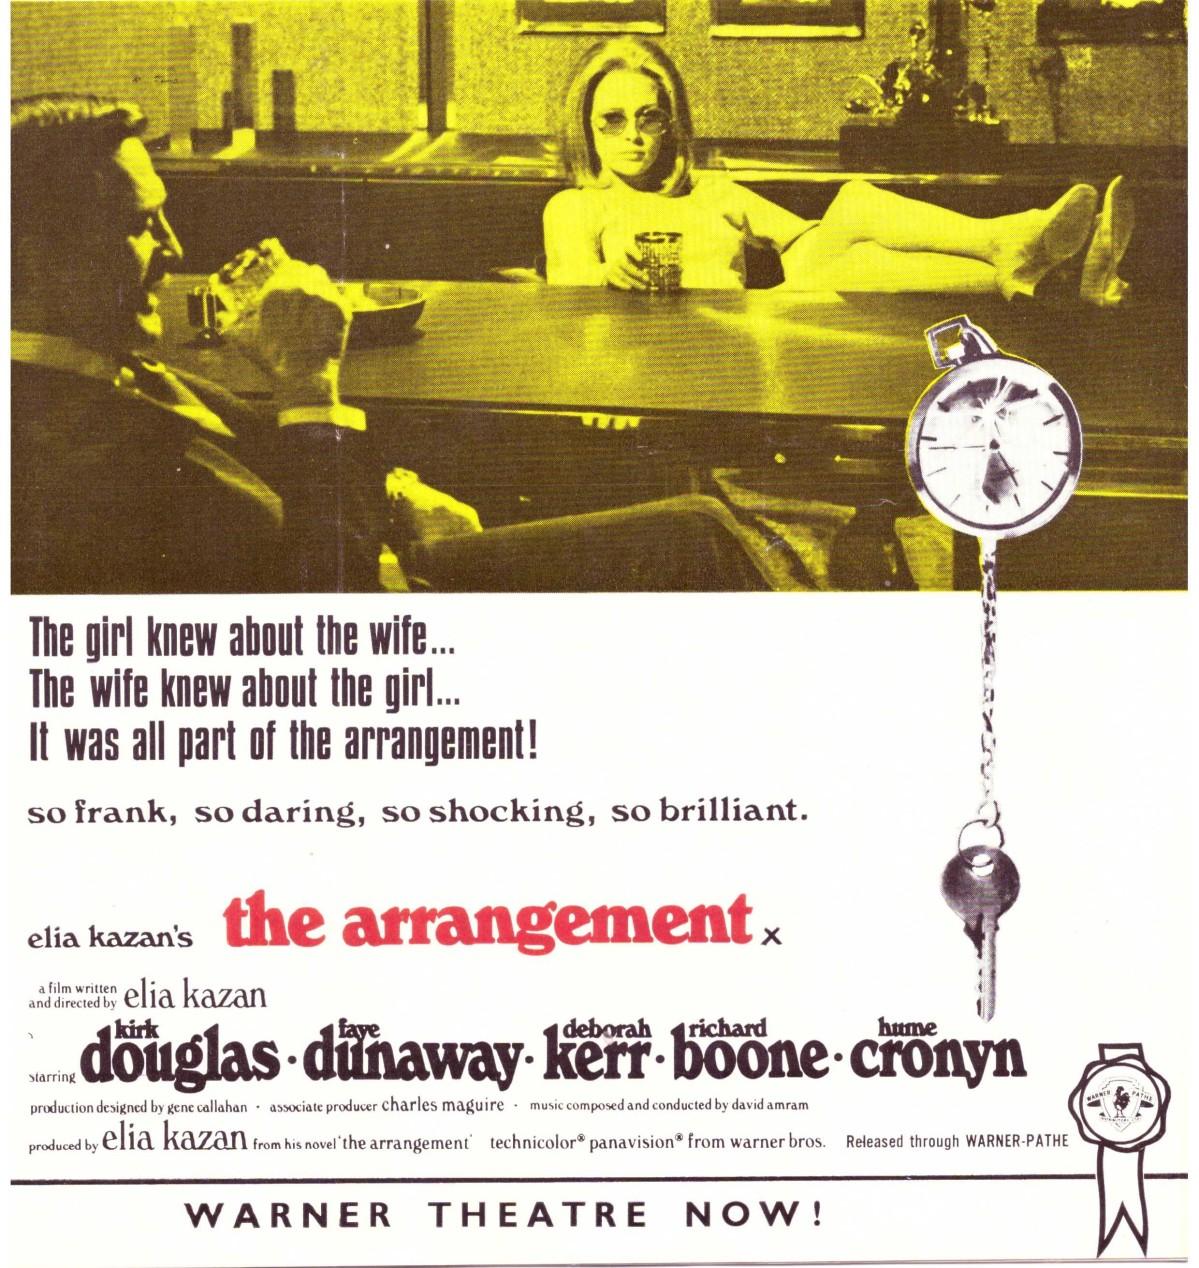 The Arrangement (1969)***